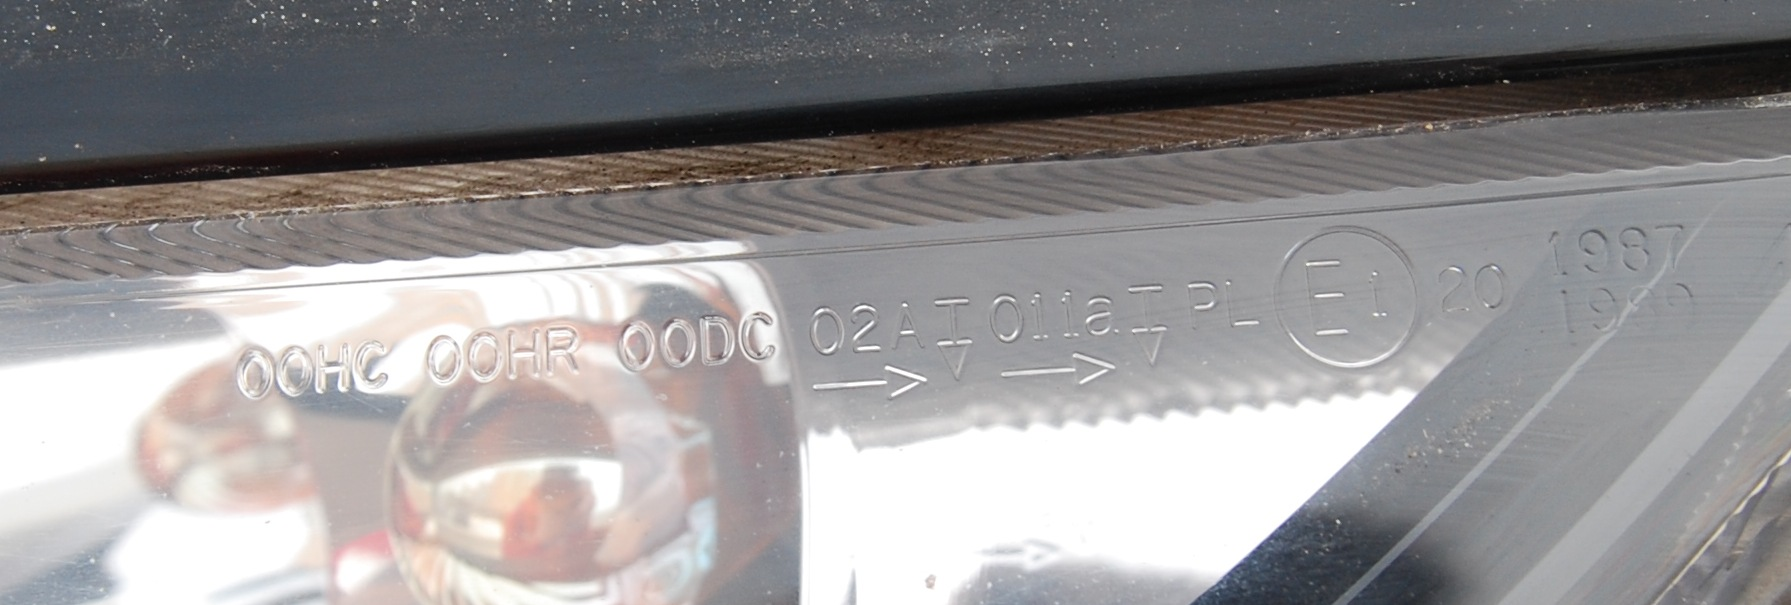 honda civic 4d маркировка фар